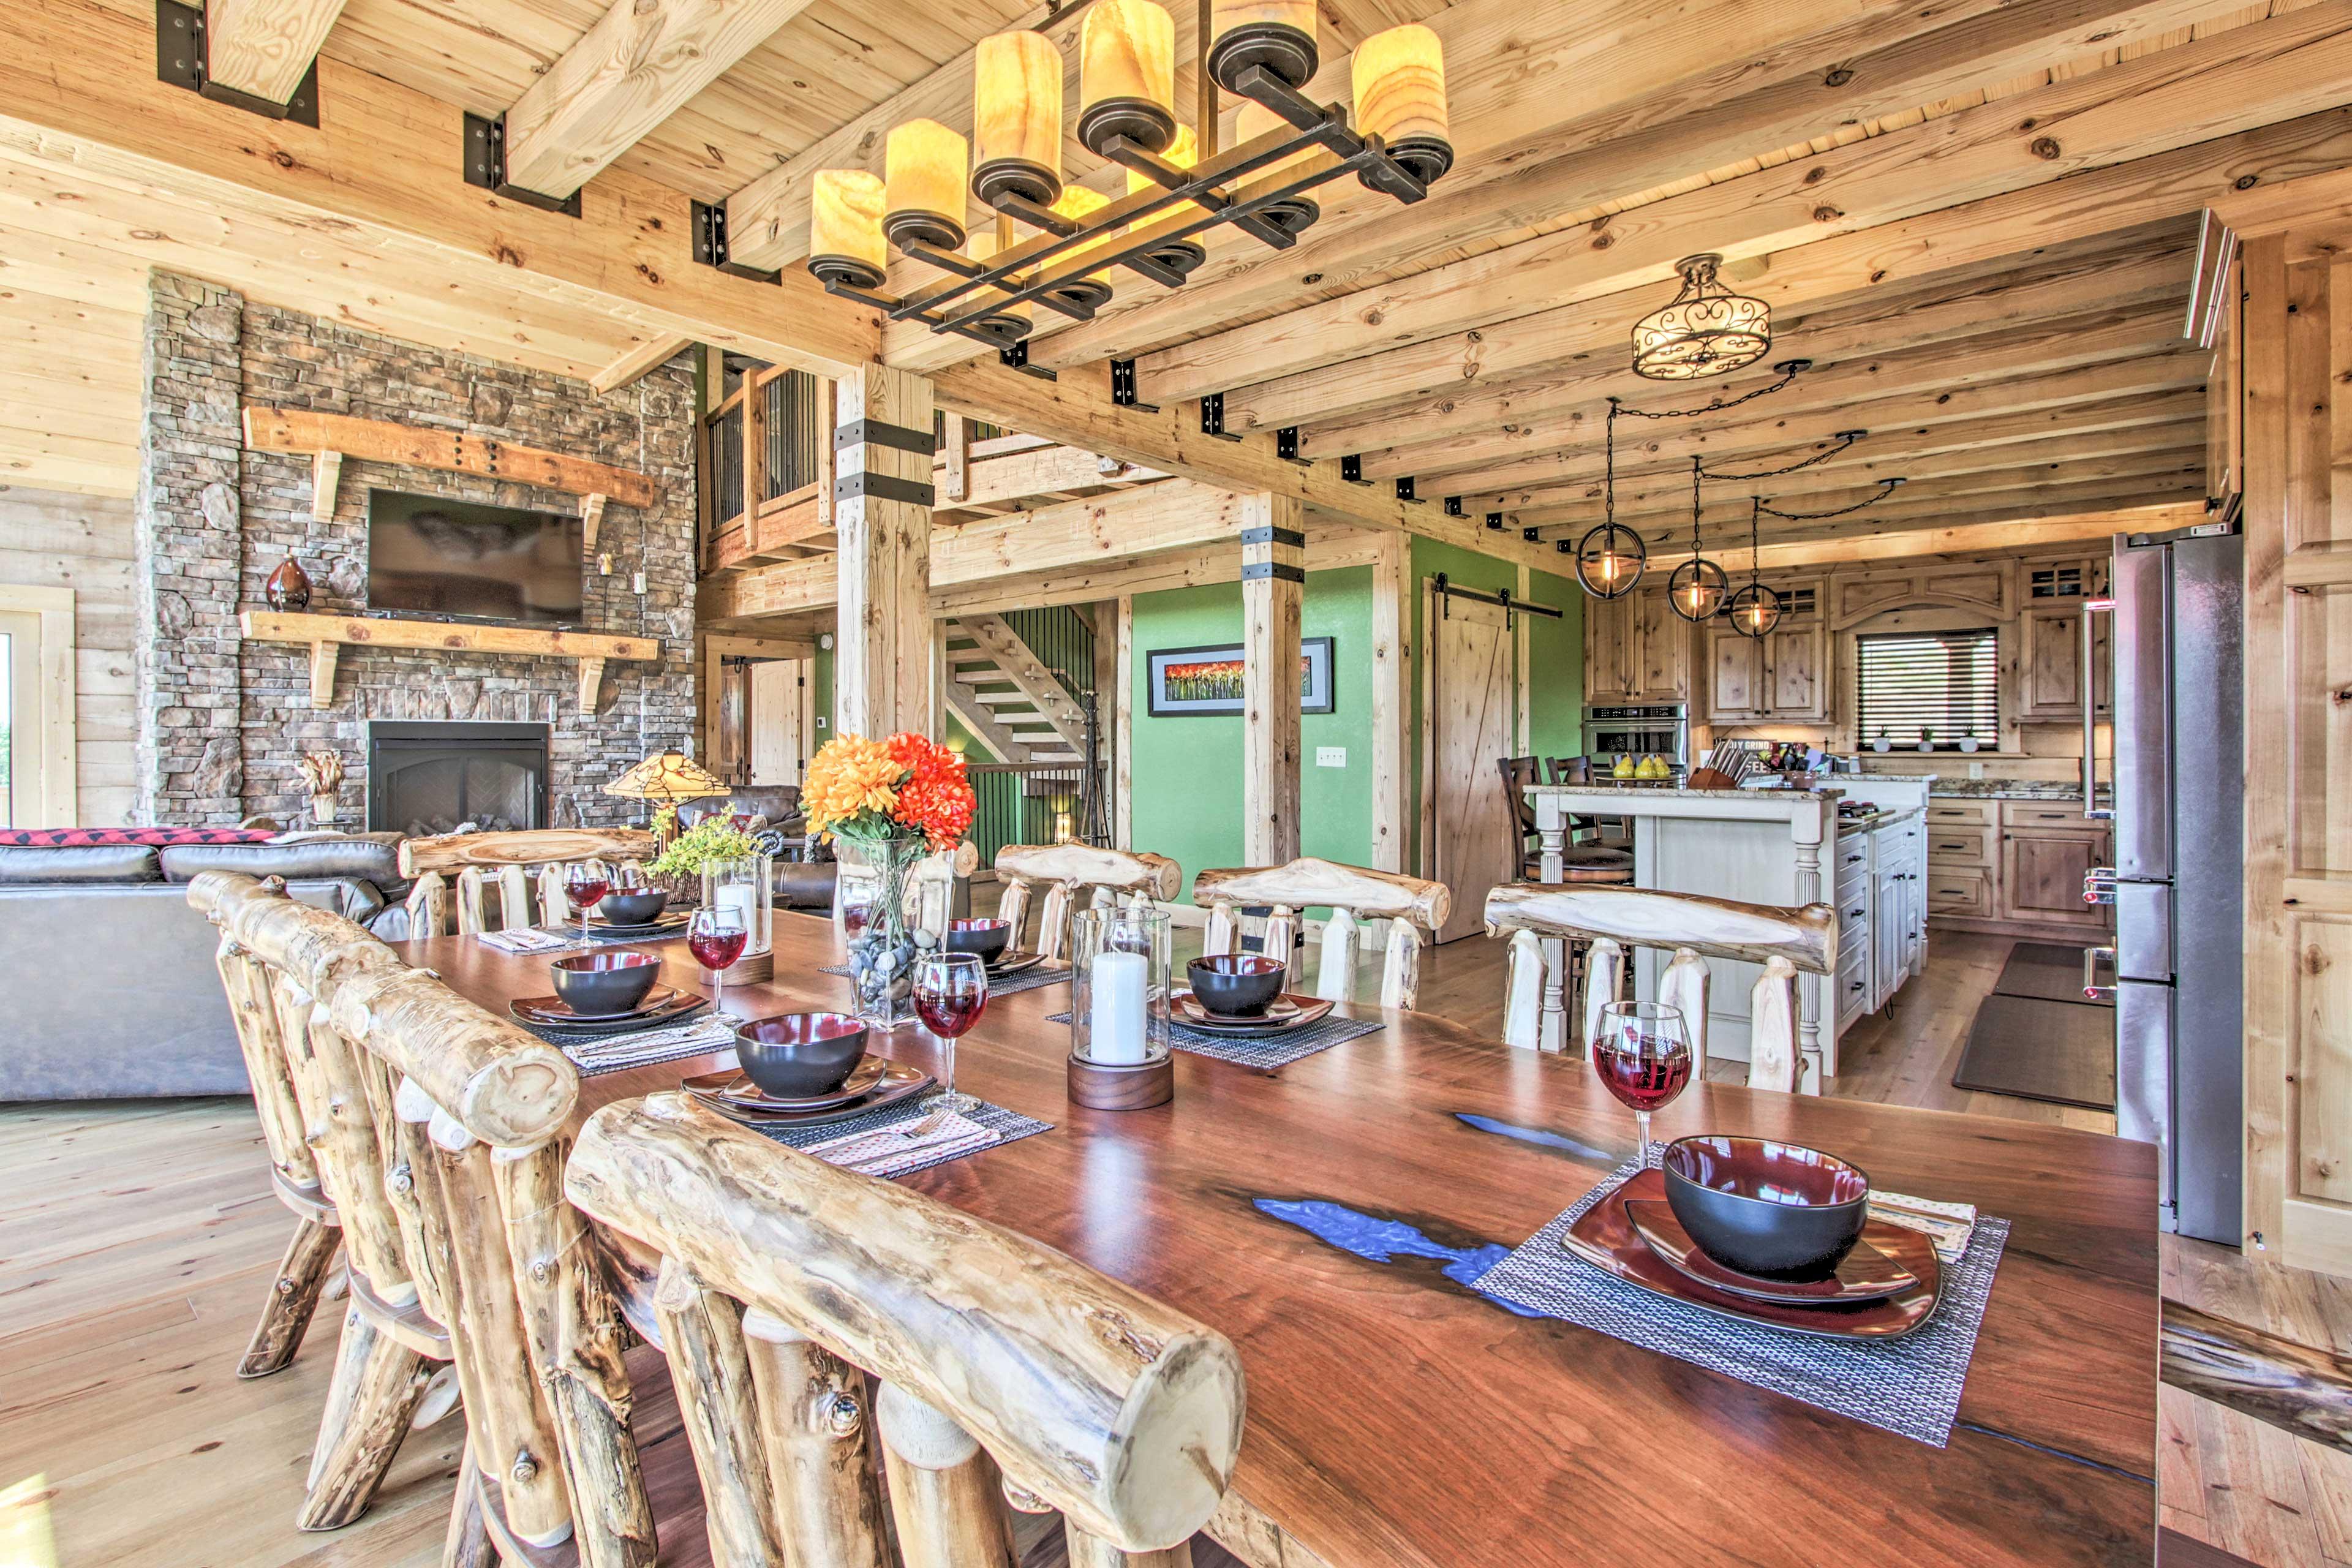 Southland Log Homes - Pick 2 Offer